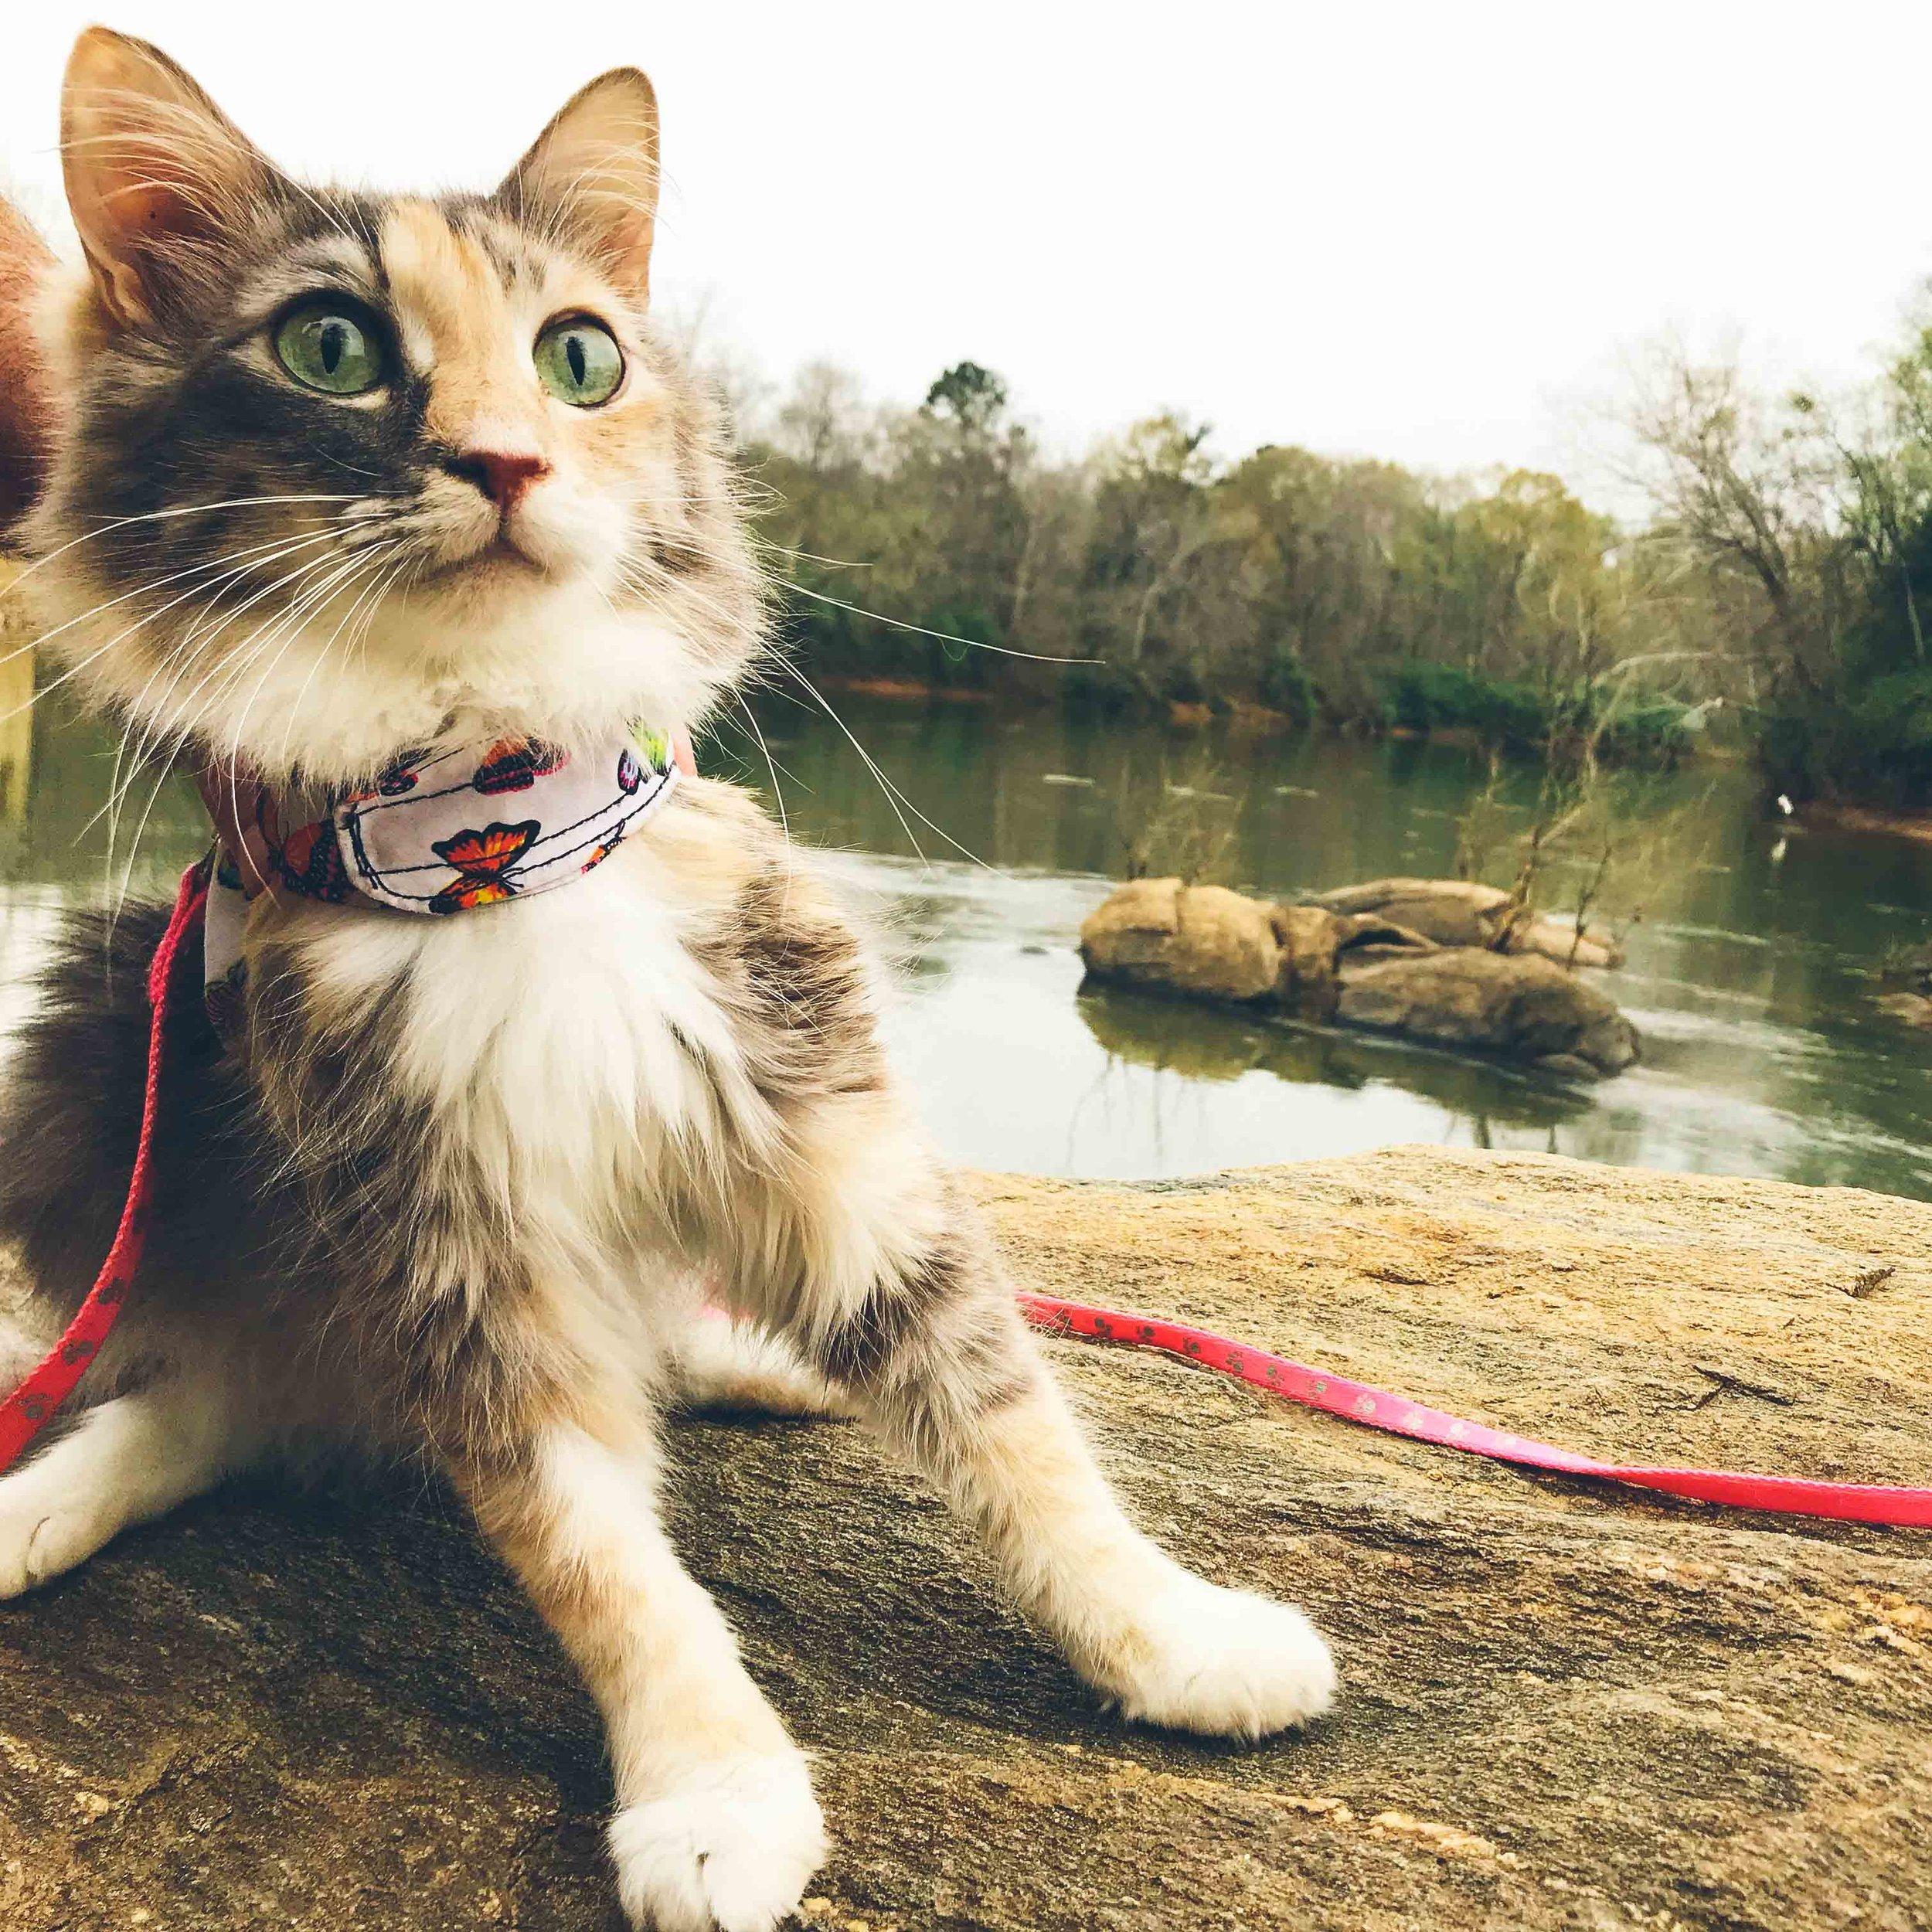 Kitty Cat Chronicles - Georgia